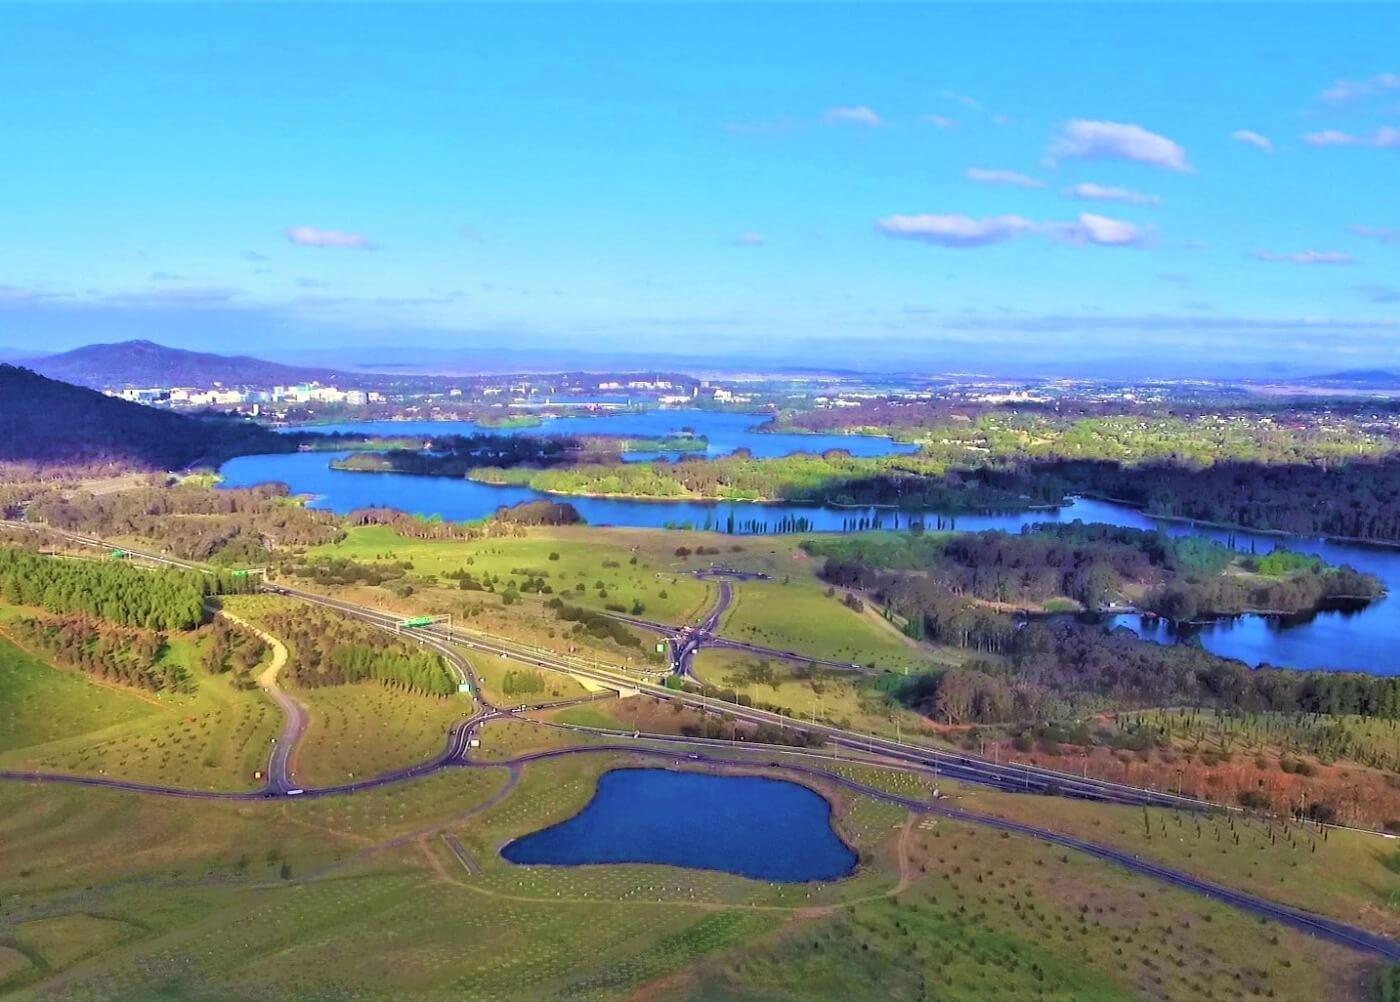 Sightseeing Canberra - Arboretum